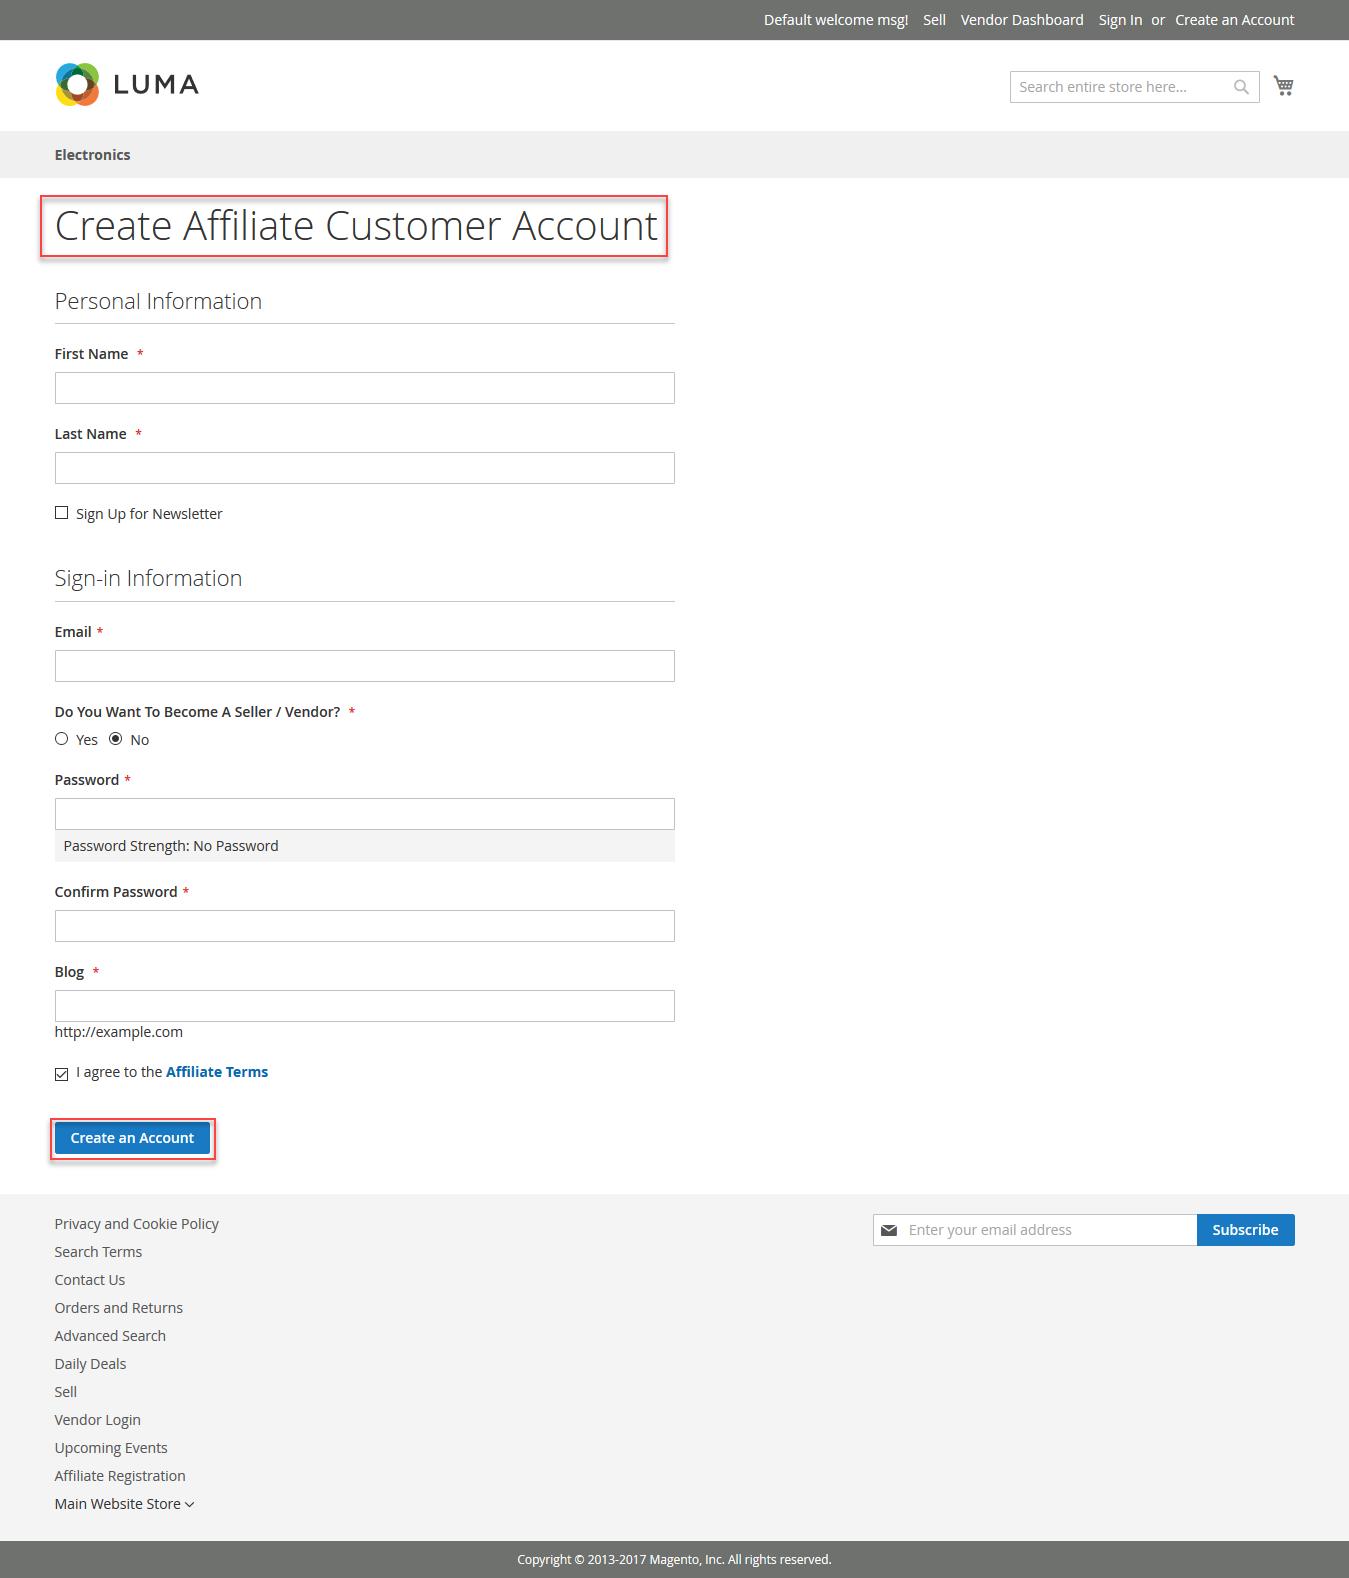 Affiliate Customer Registration